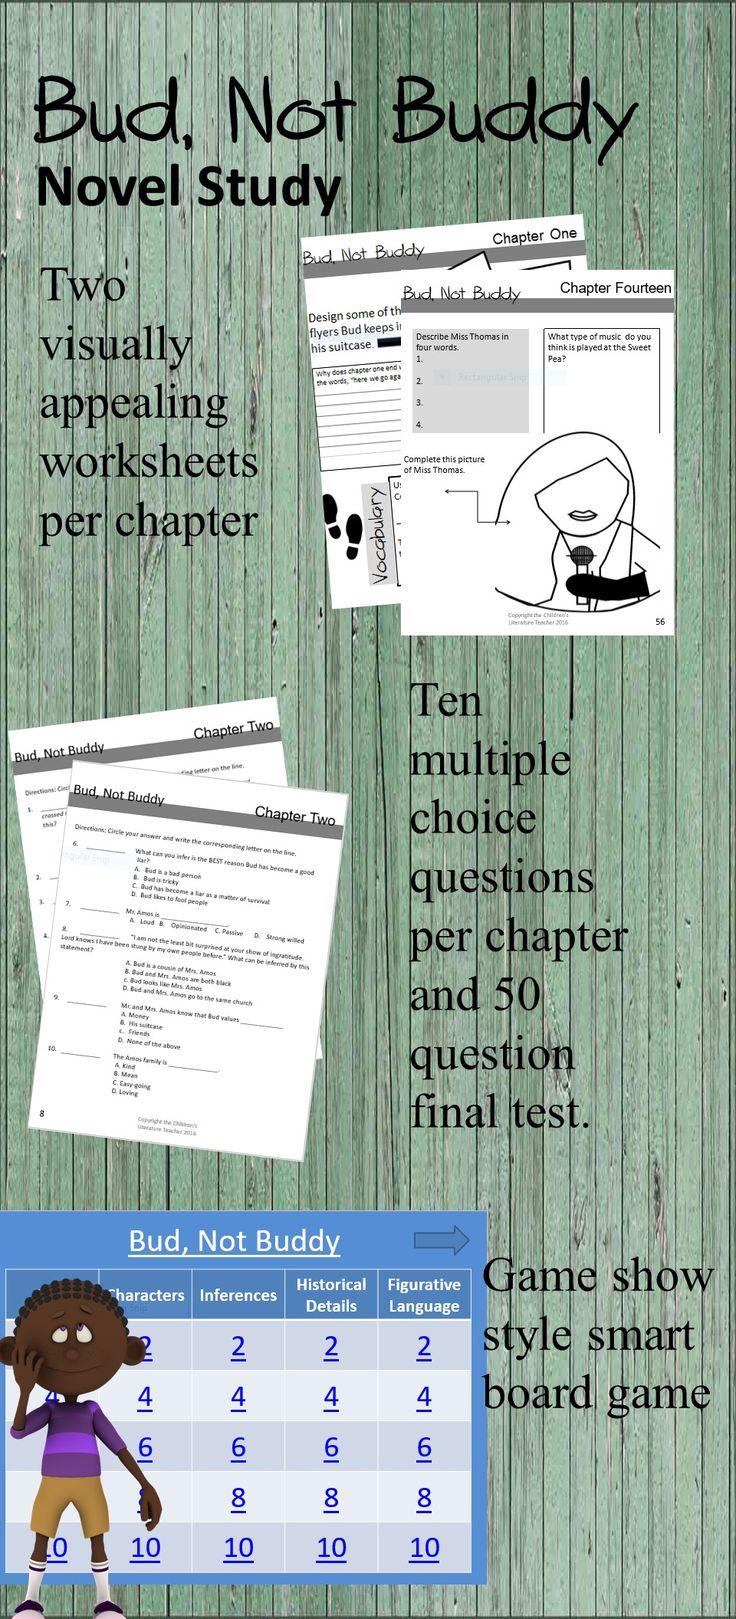 Uncategorized Bud Not Buddy Worksheets 94 best 4th5th grade favorites images on pinterest bud not buddy novel study bundle chapter work game assessment